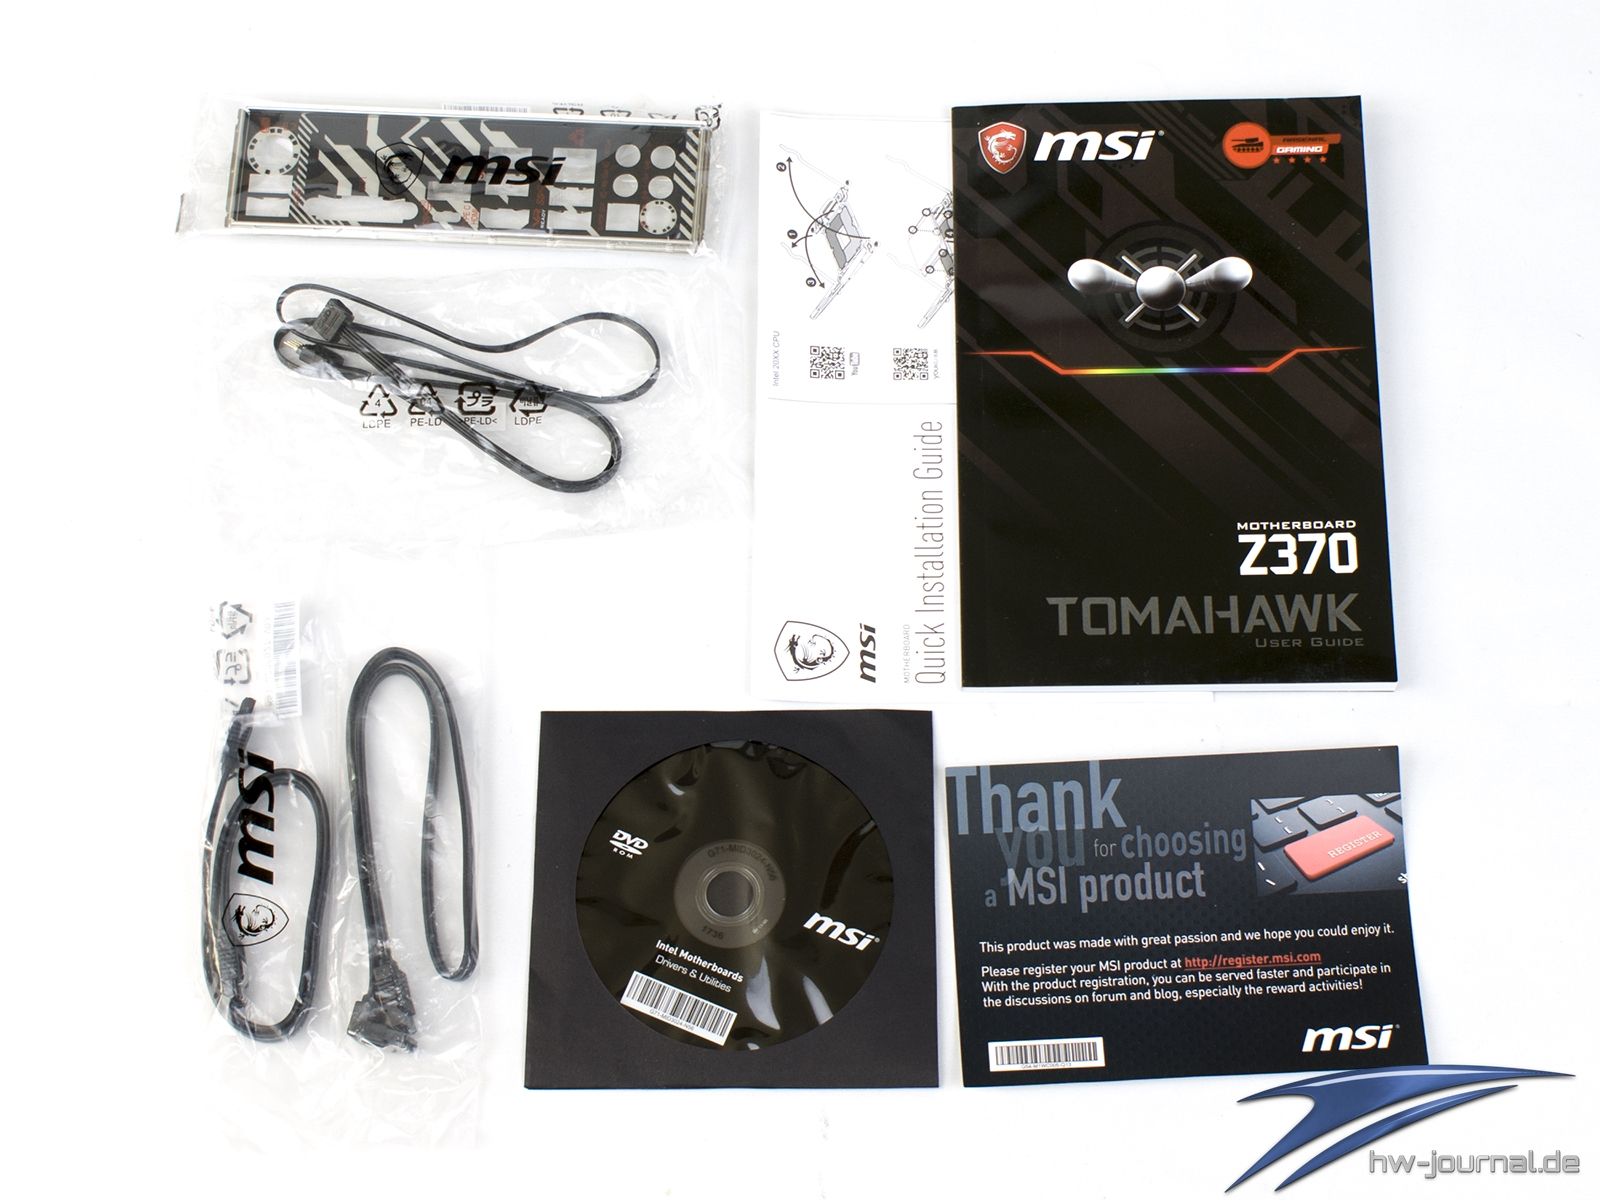 Test: MSI Z370 Tomahawk - Hardware-Journal